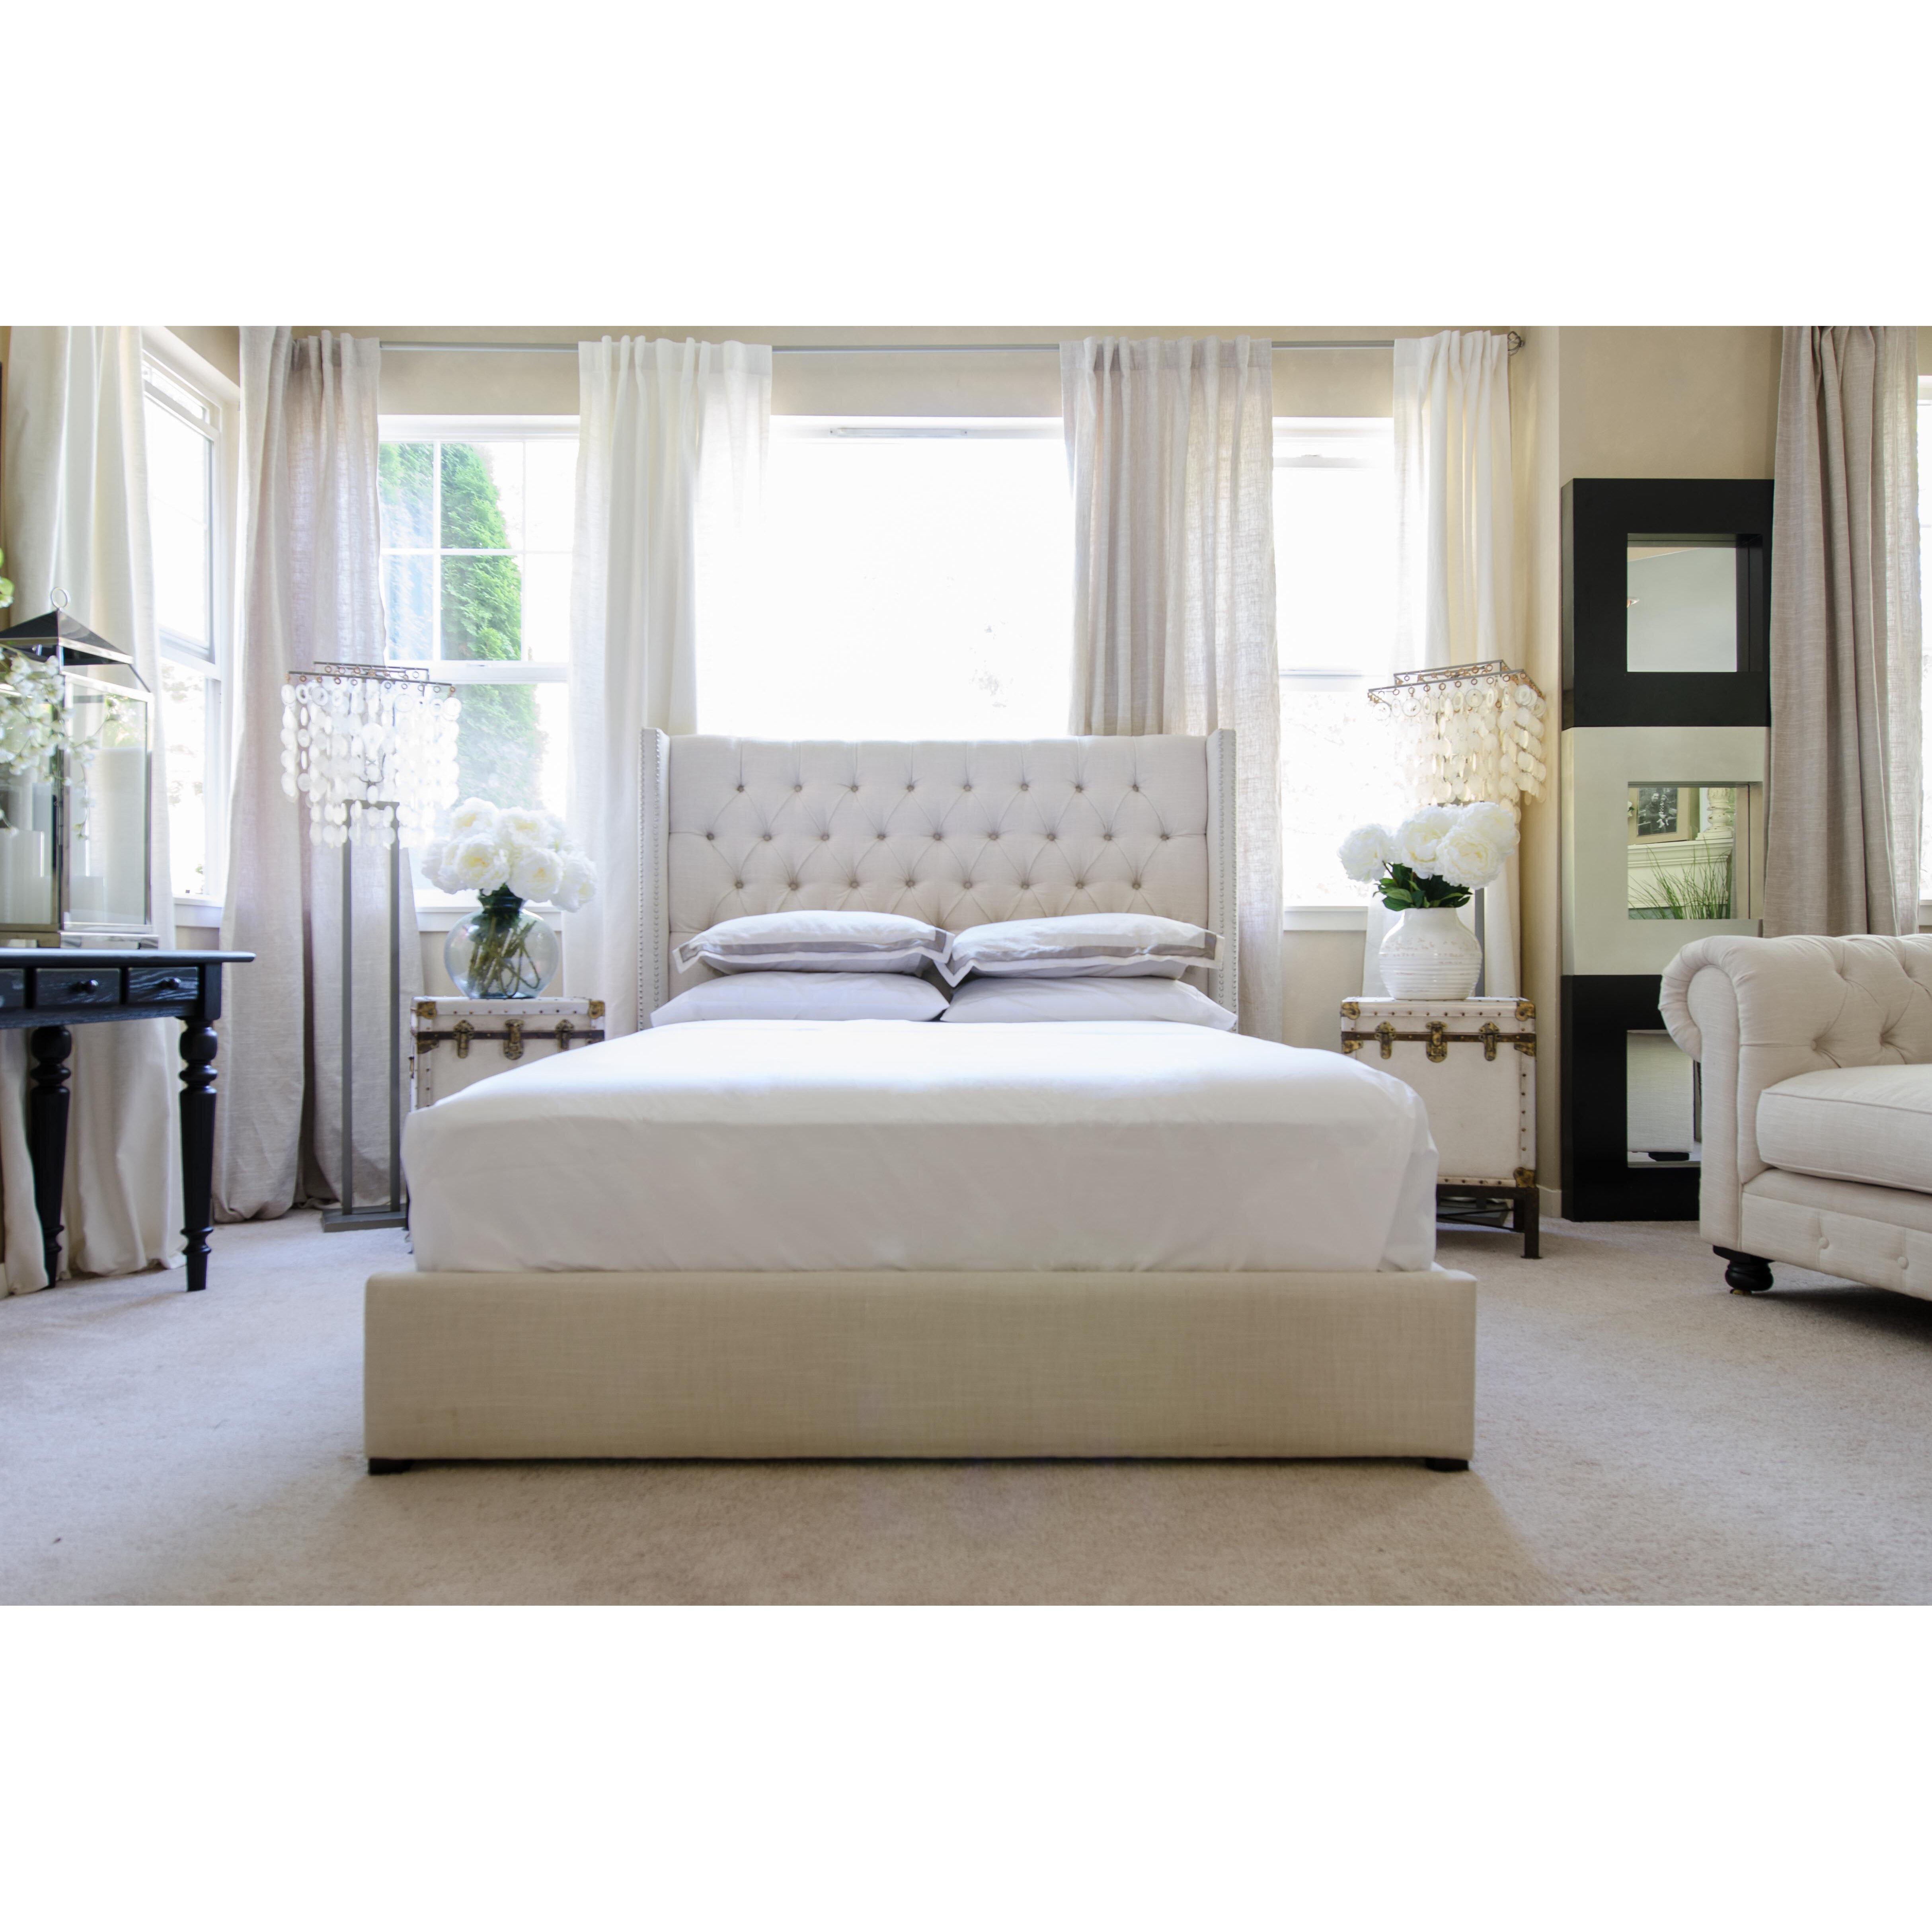 Elements Fine Home Furnishings Upholstered Platform Bed Reviews Wayfair